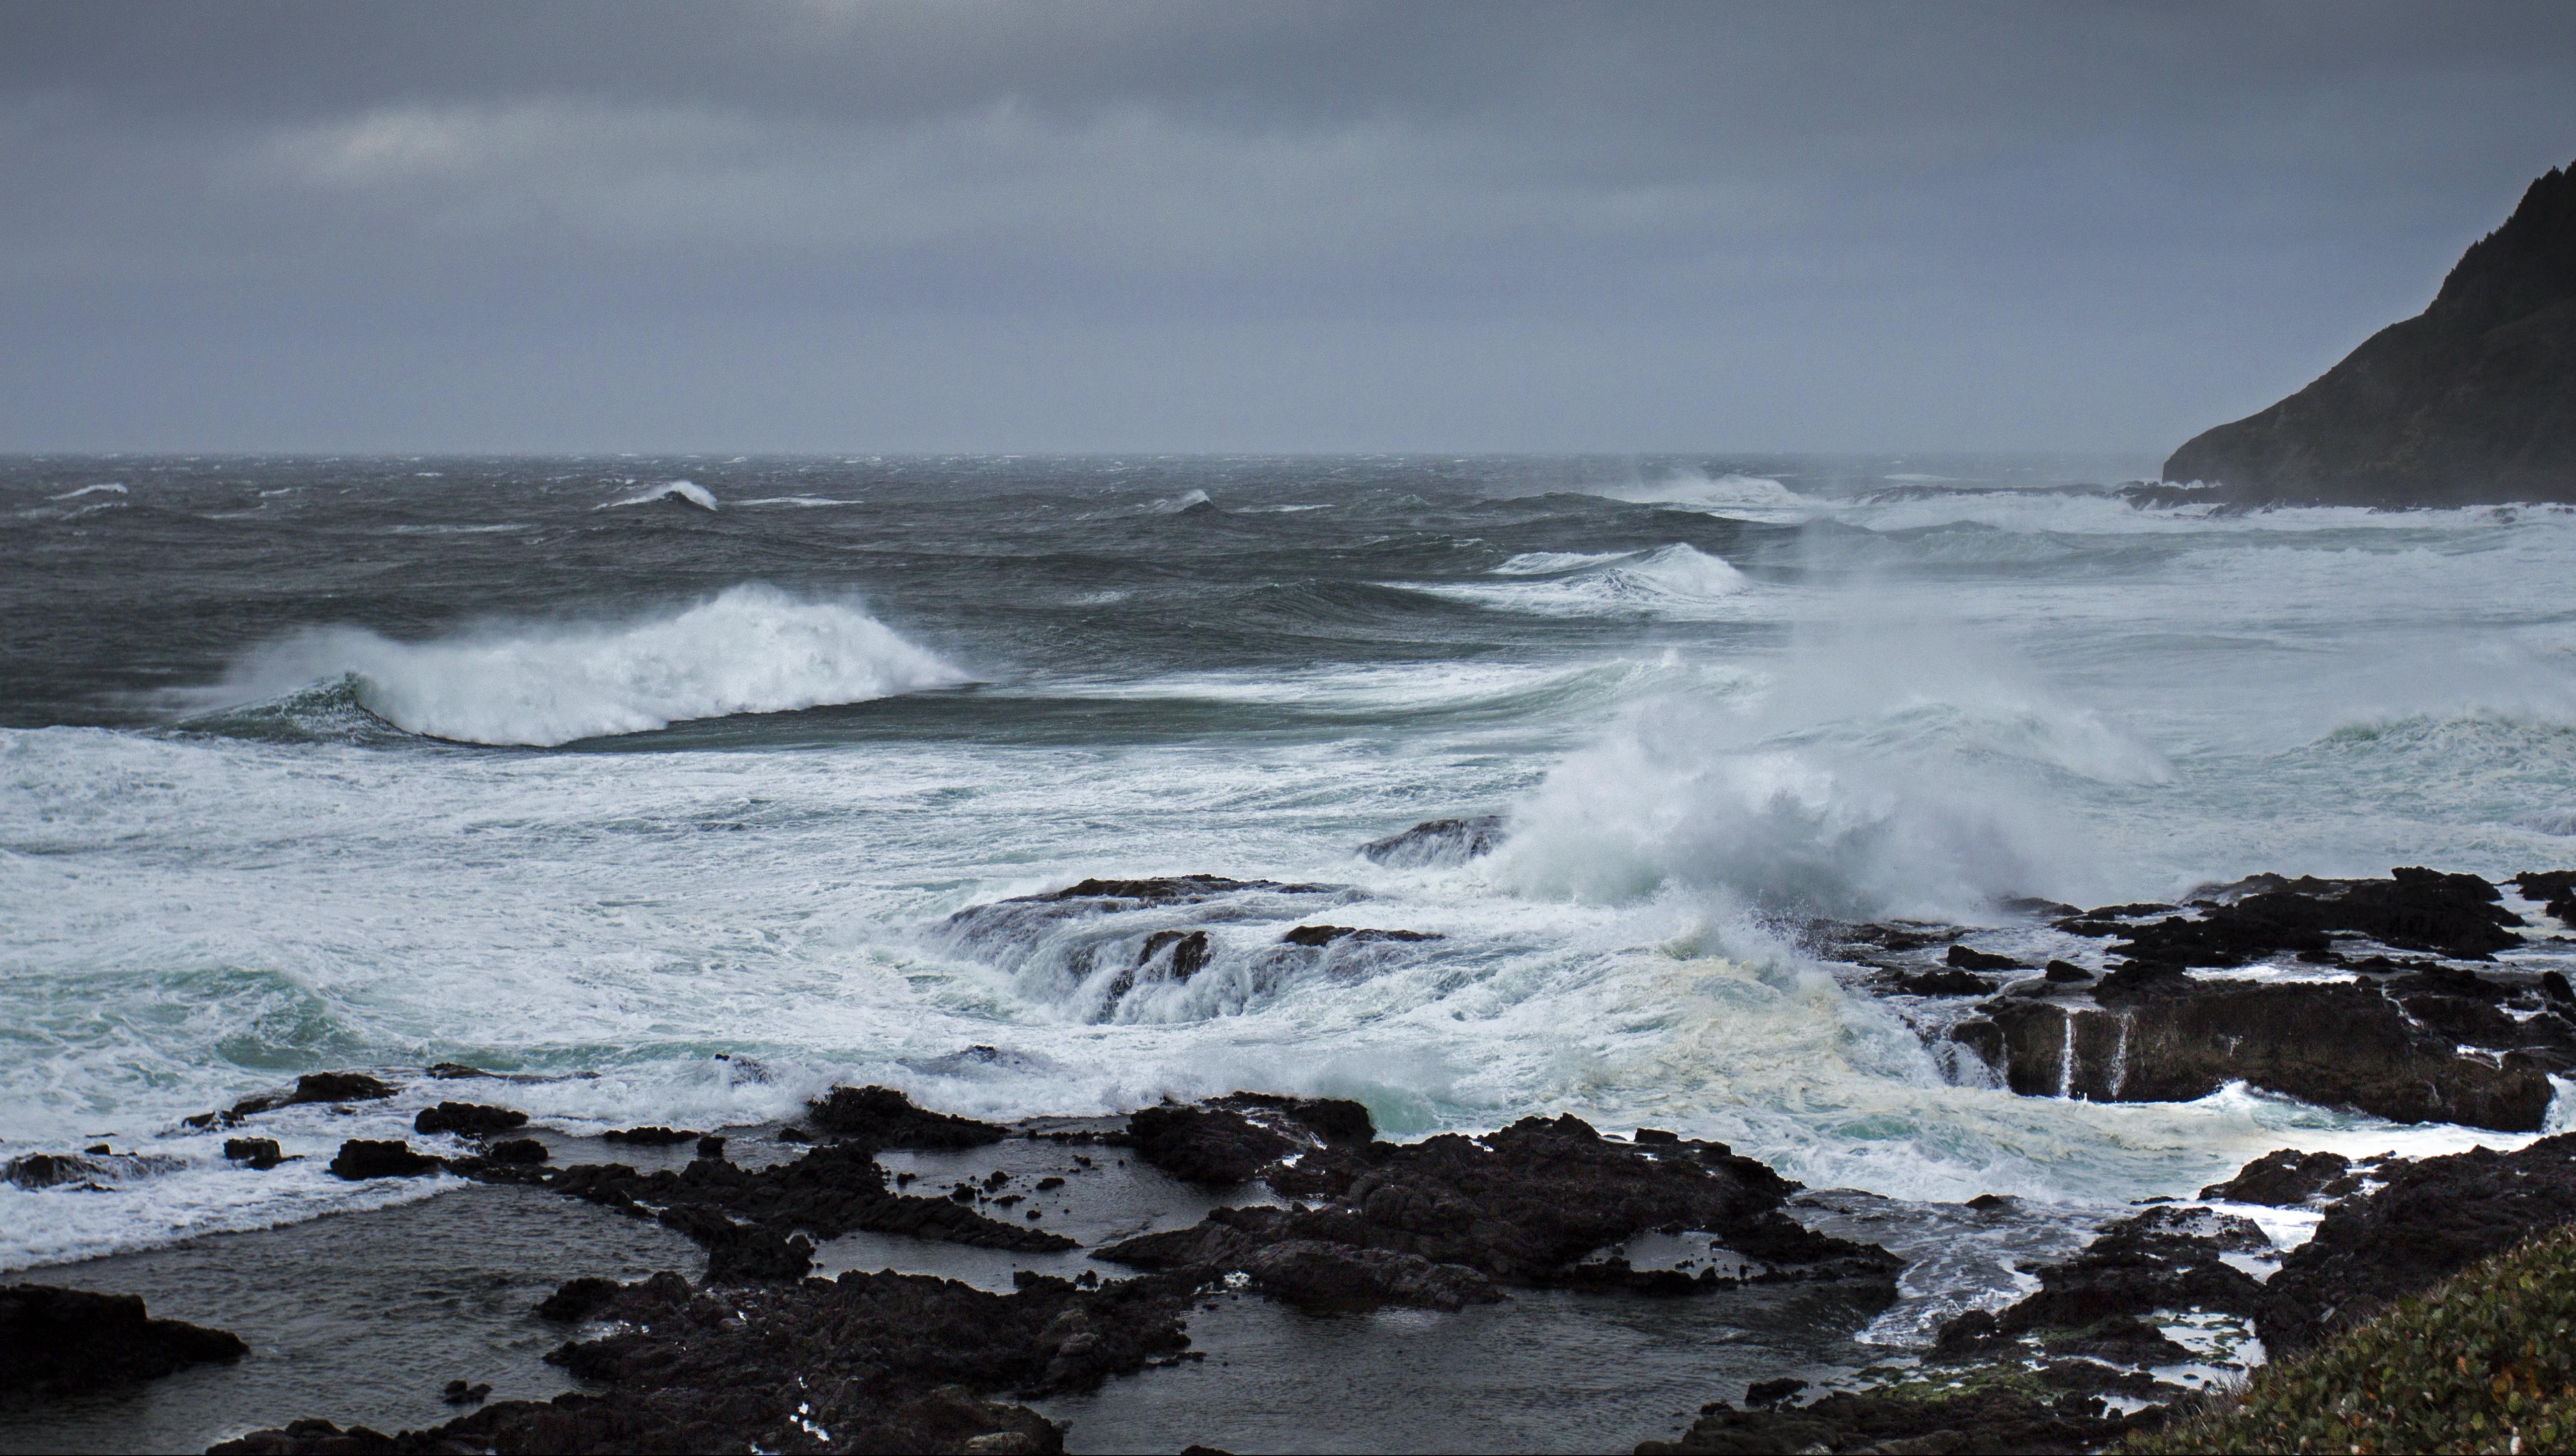 Winter storm cape perpetua, oregon photo